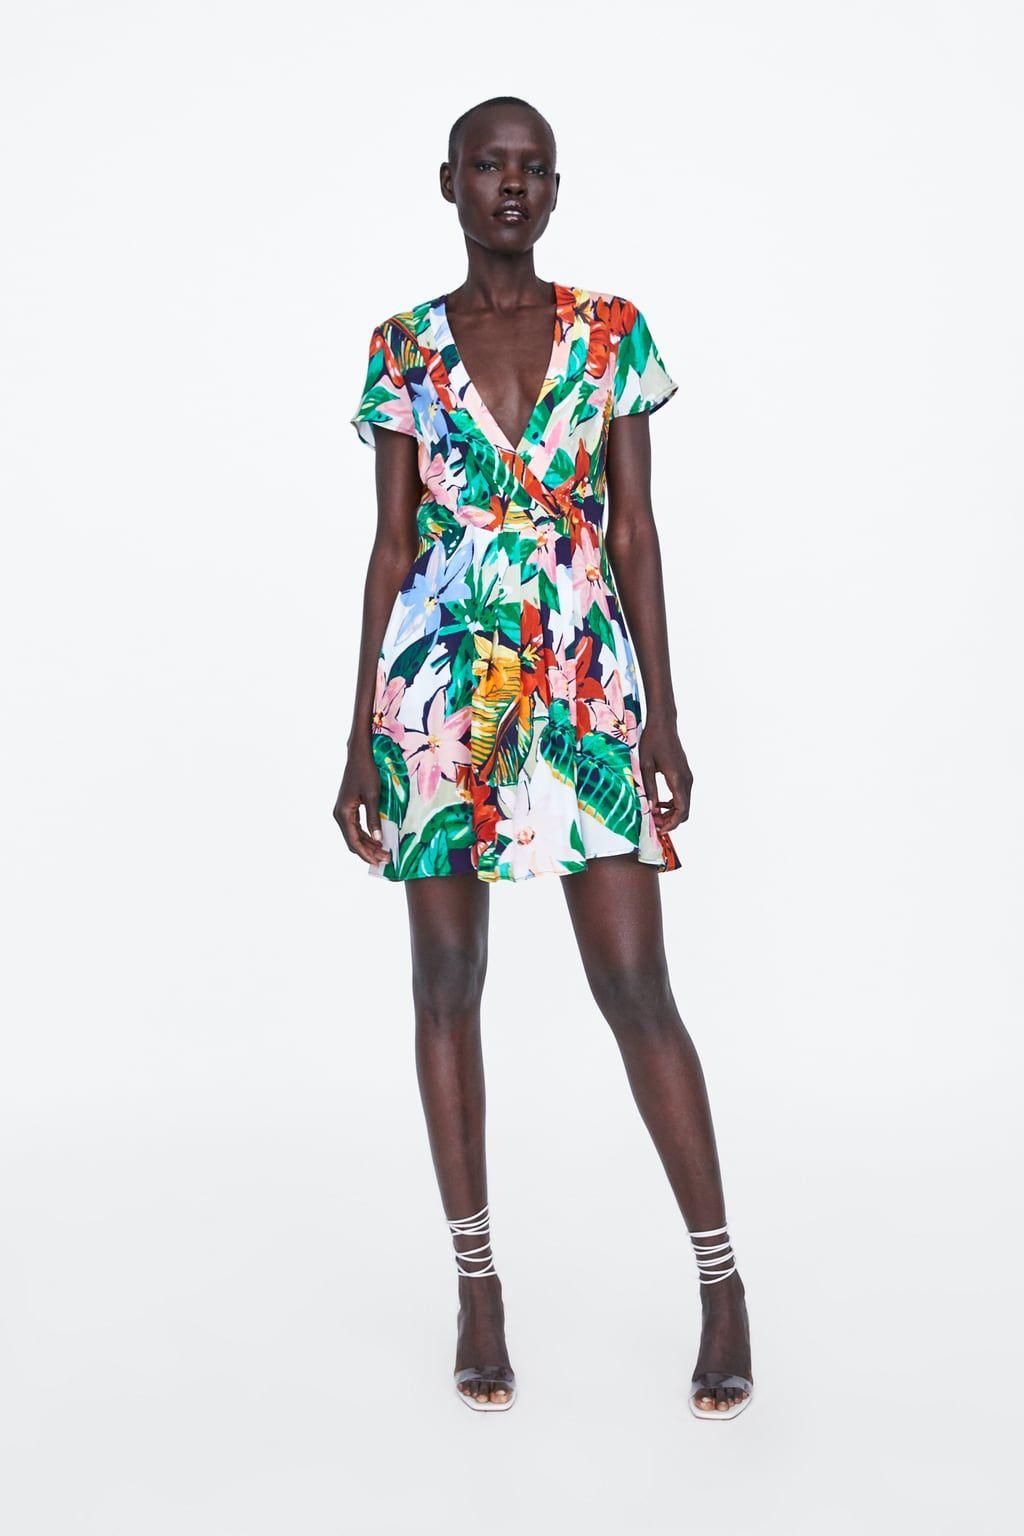 vestido estampado floral | vestiti, scollo a v, stampe floreali